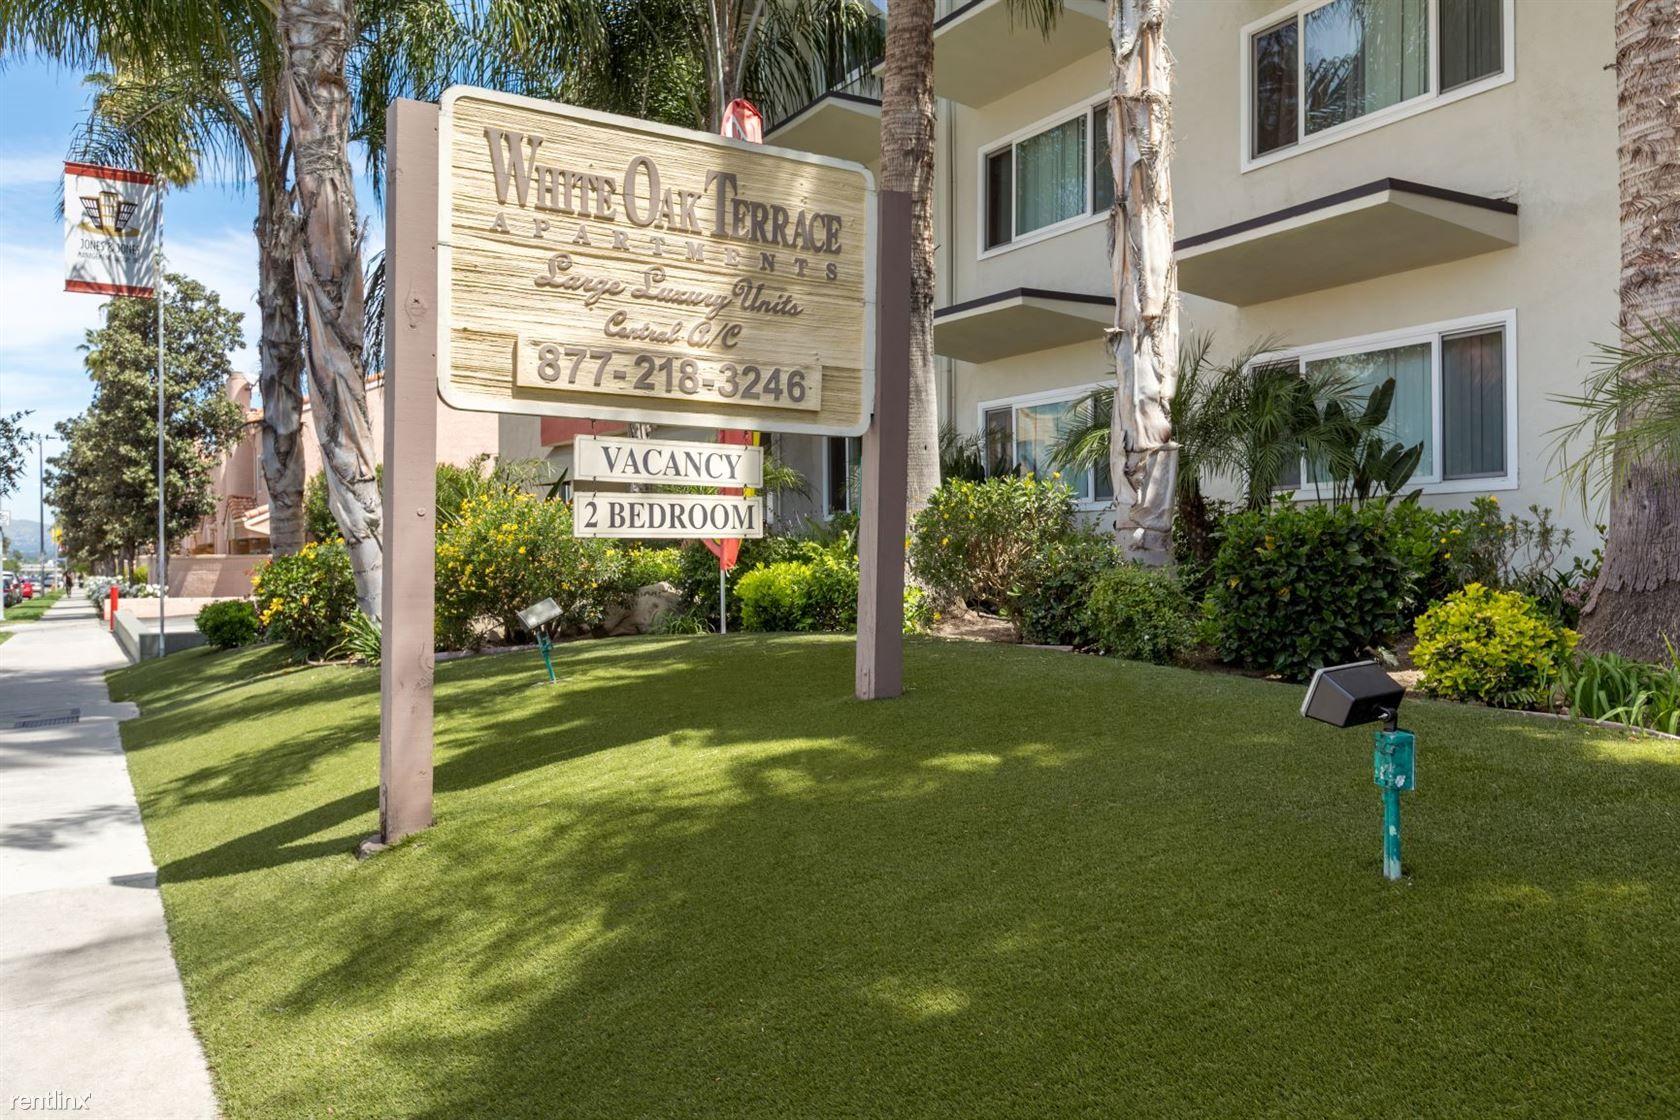 White Oak Terrace Apartments